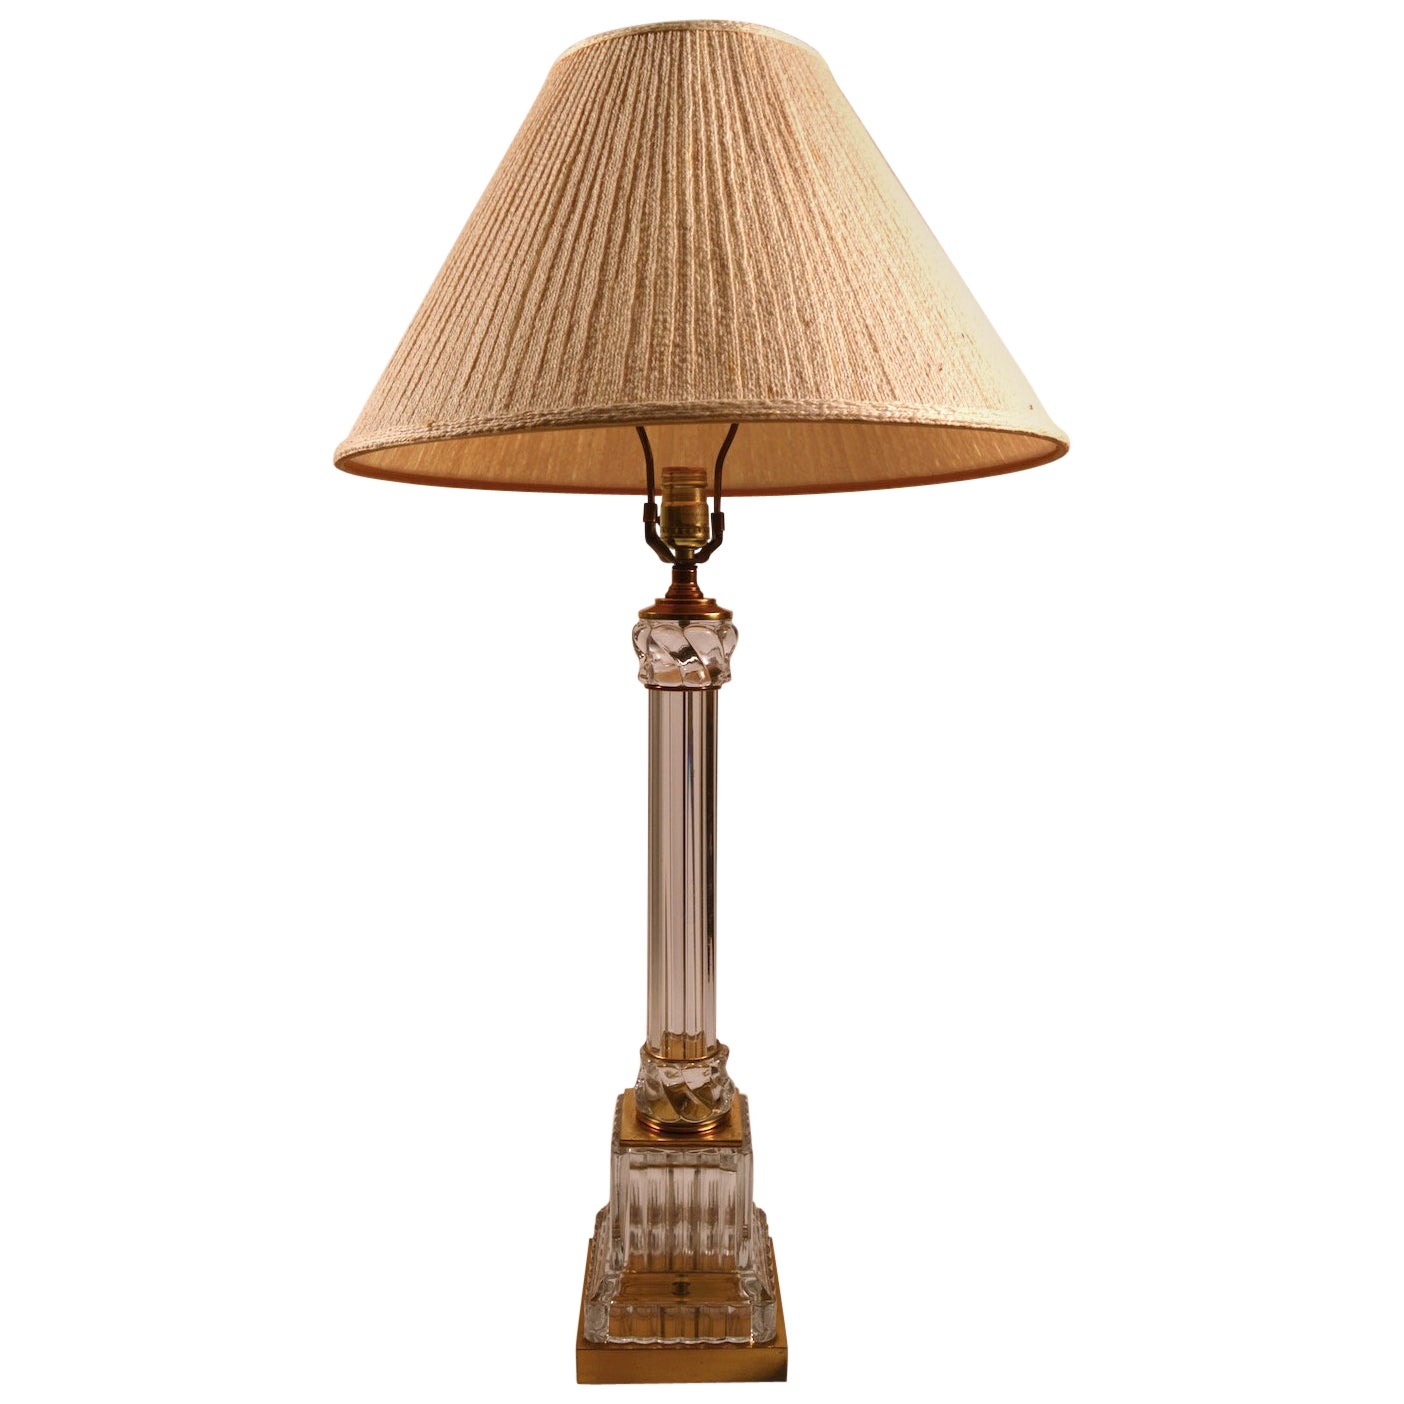 Classical Glass Column Lamp by Paul Hanson